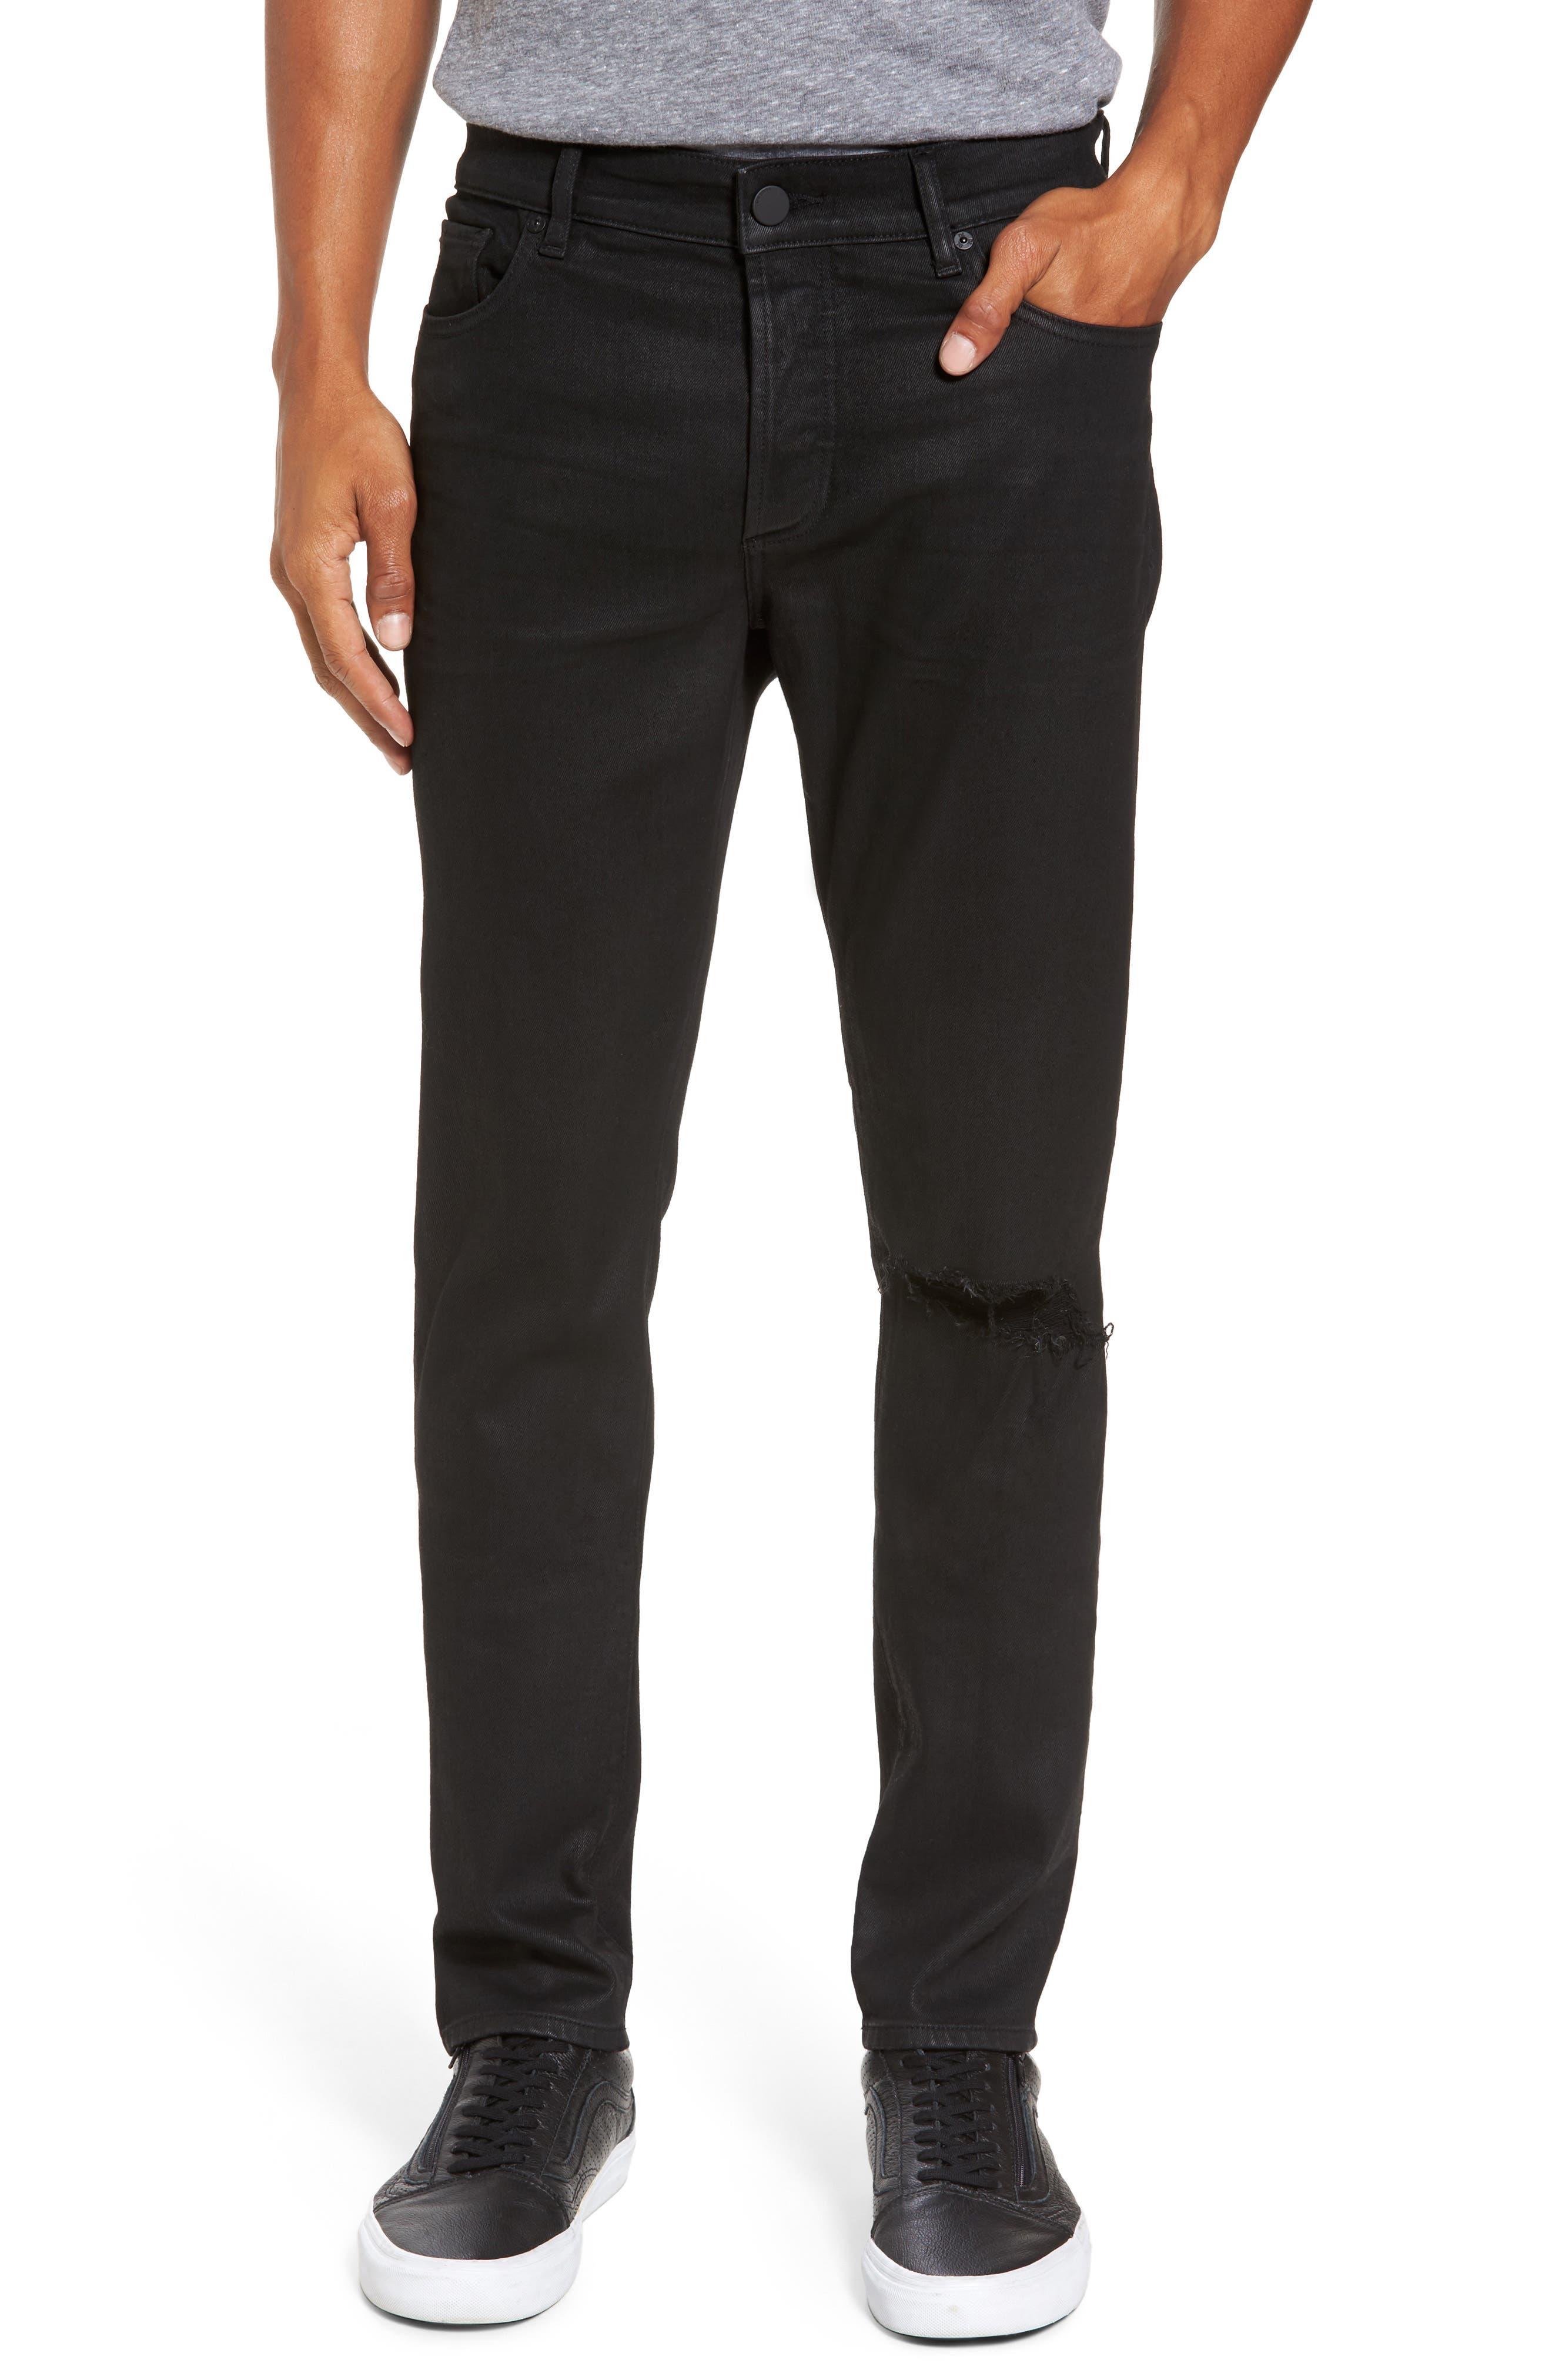 Hunter Skinny Jeans,                         Main,                         color, Vice